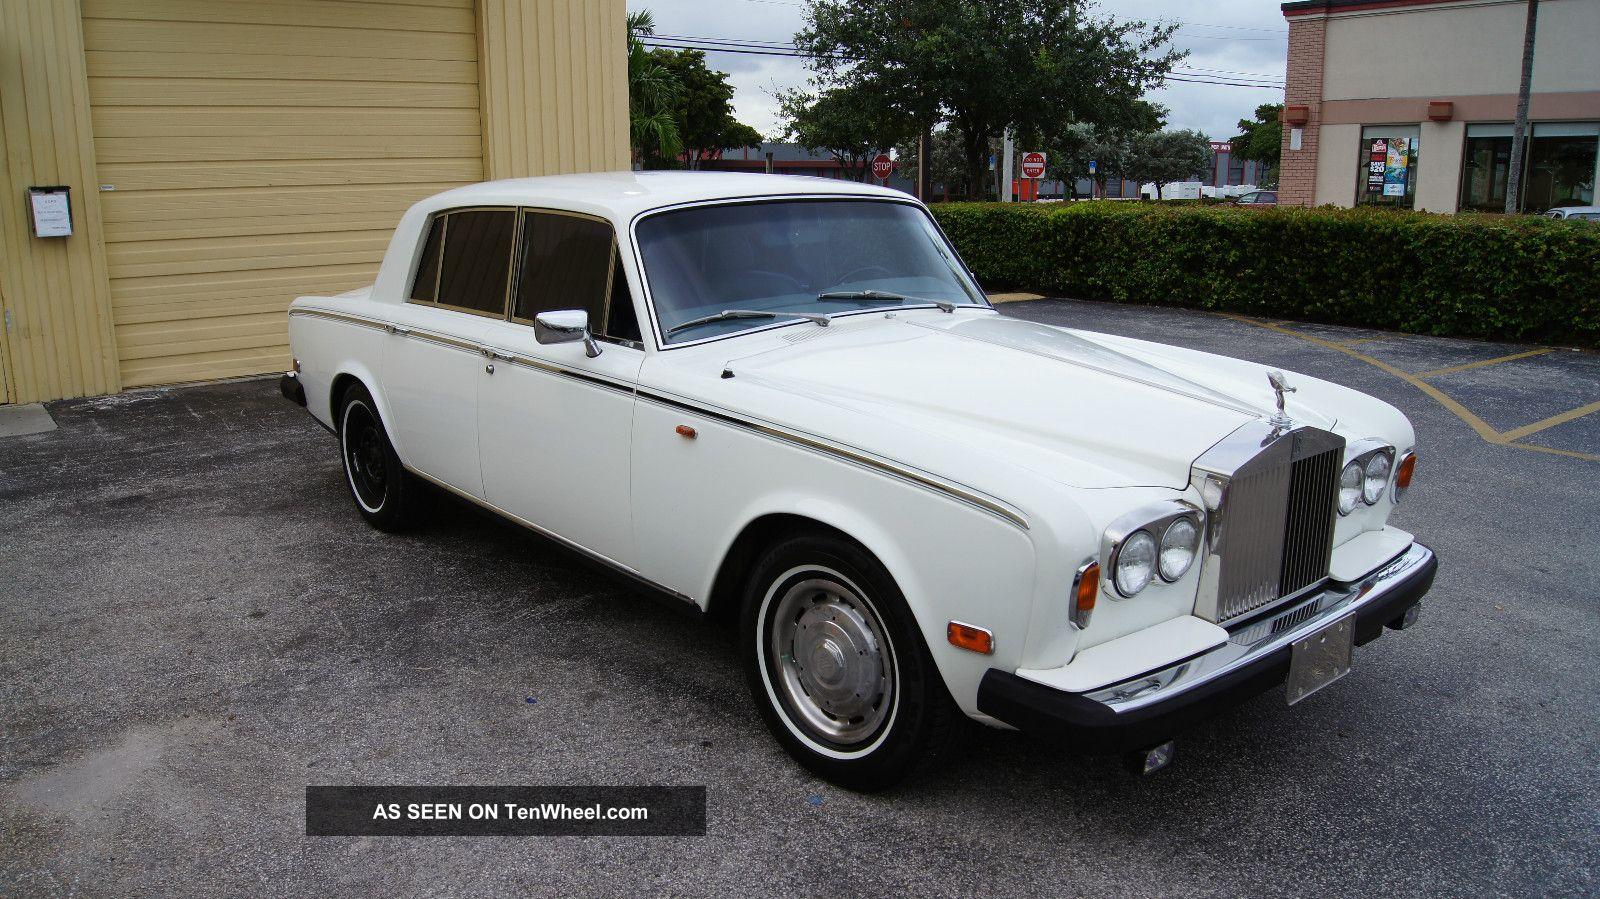 1979 Rolls - Royce Silver Shadow Ii White Silver Shadow photo